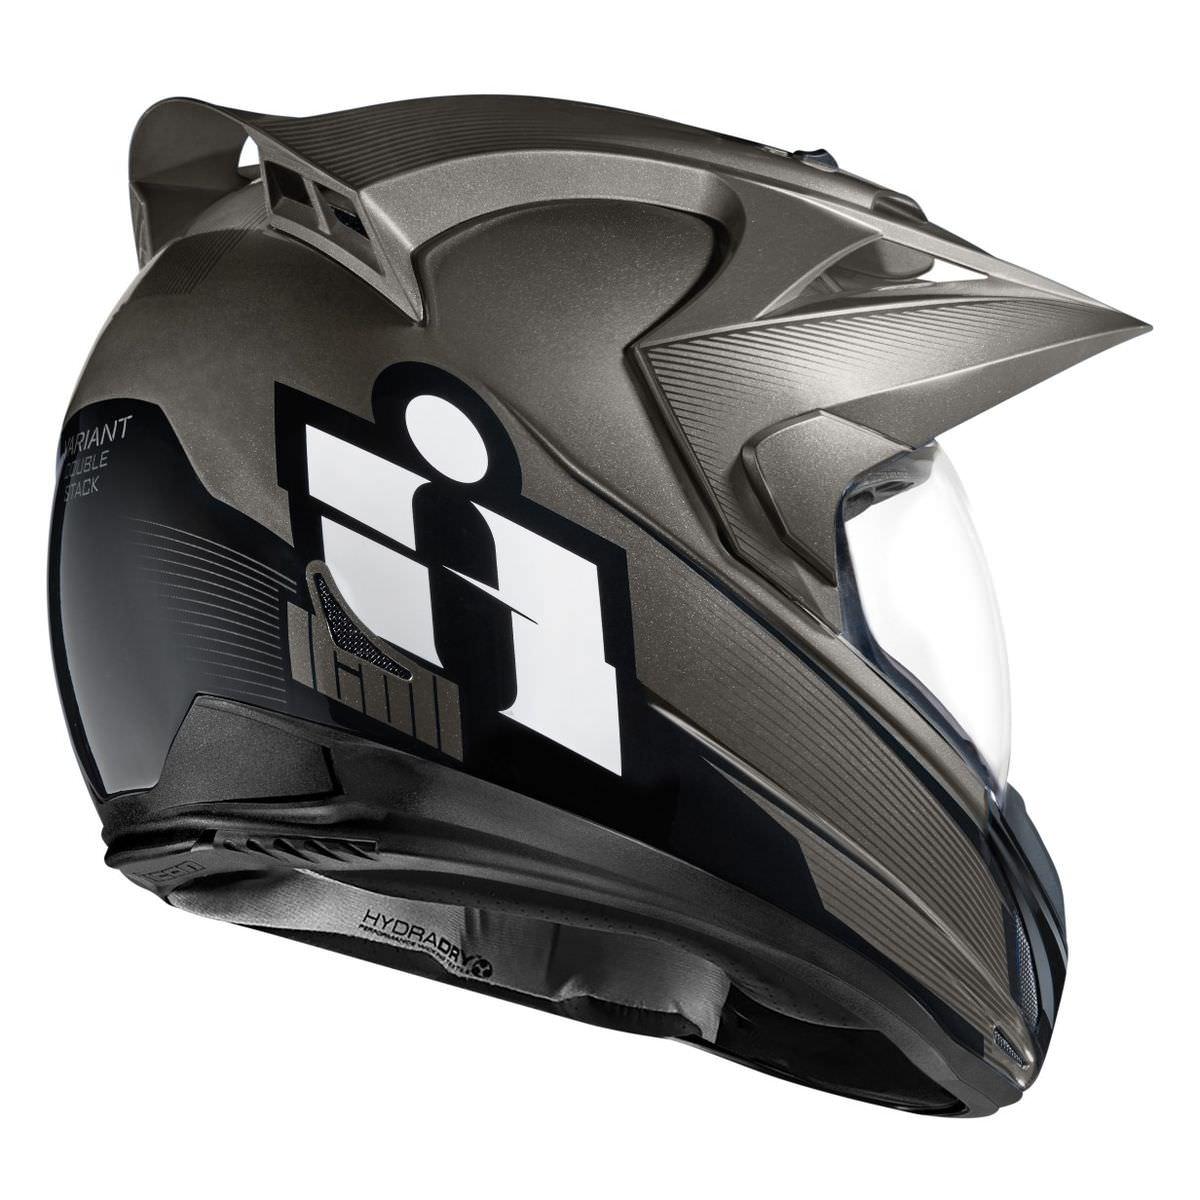 Icon Variant Double Stack Helmet 2 - Icon Variant Double Stack Helmet